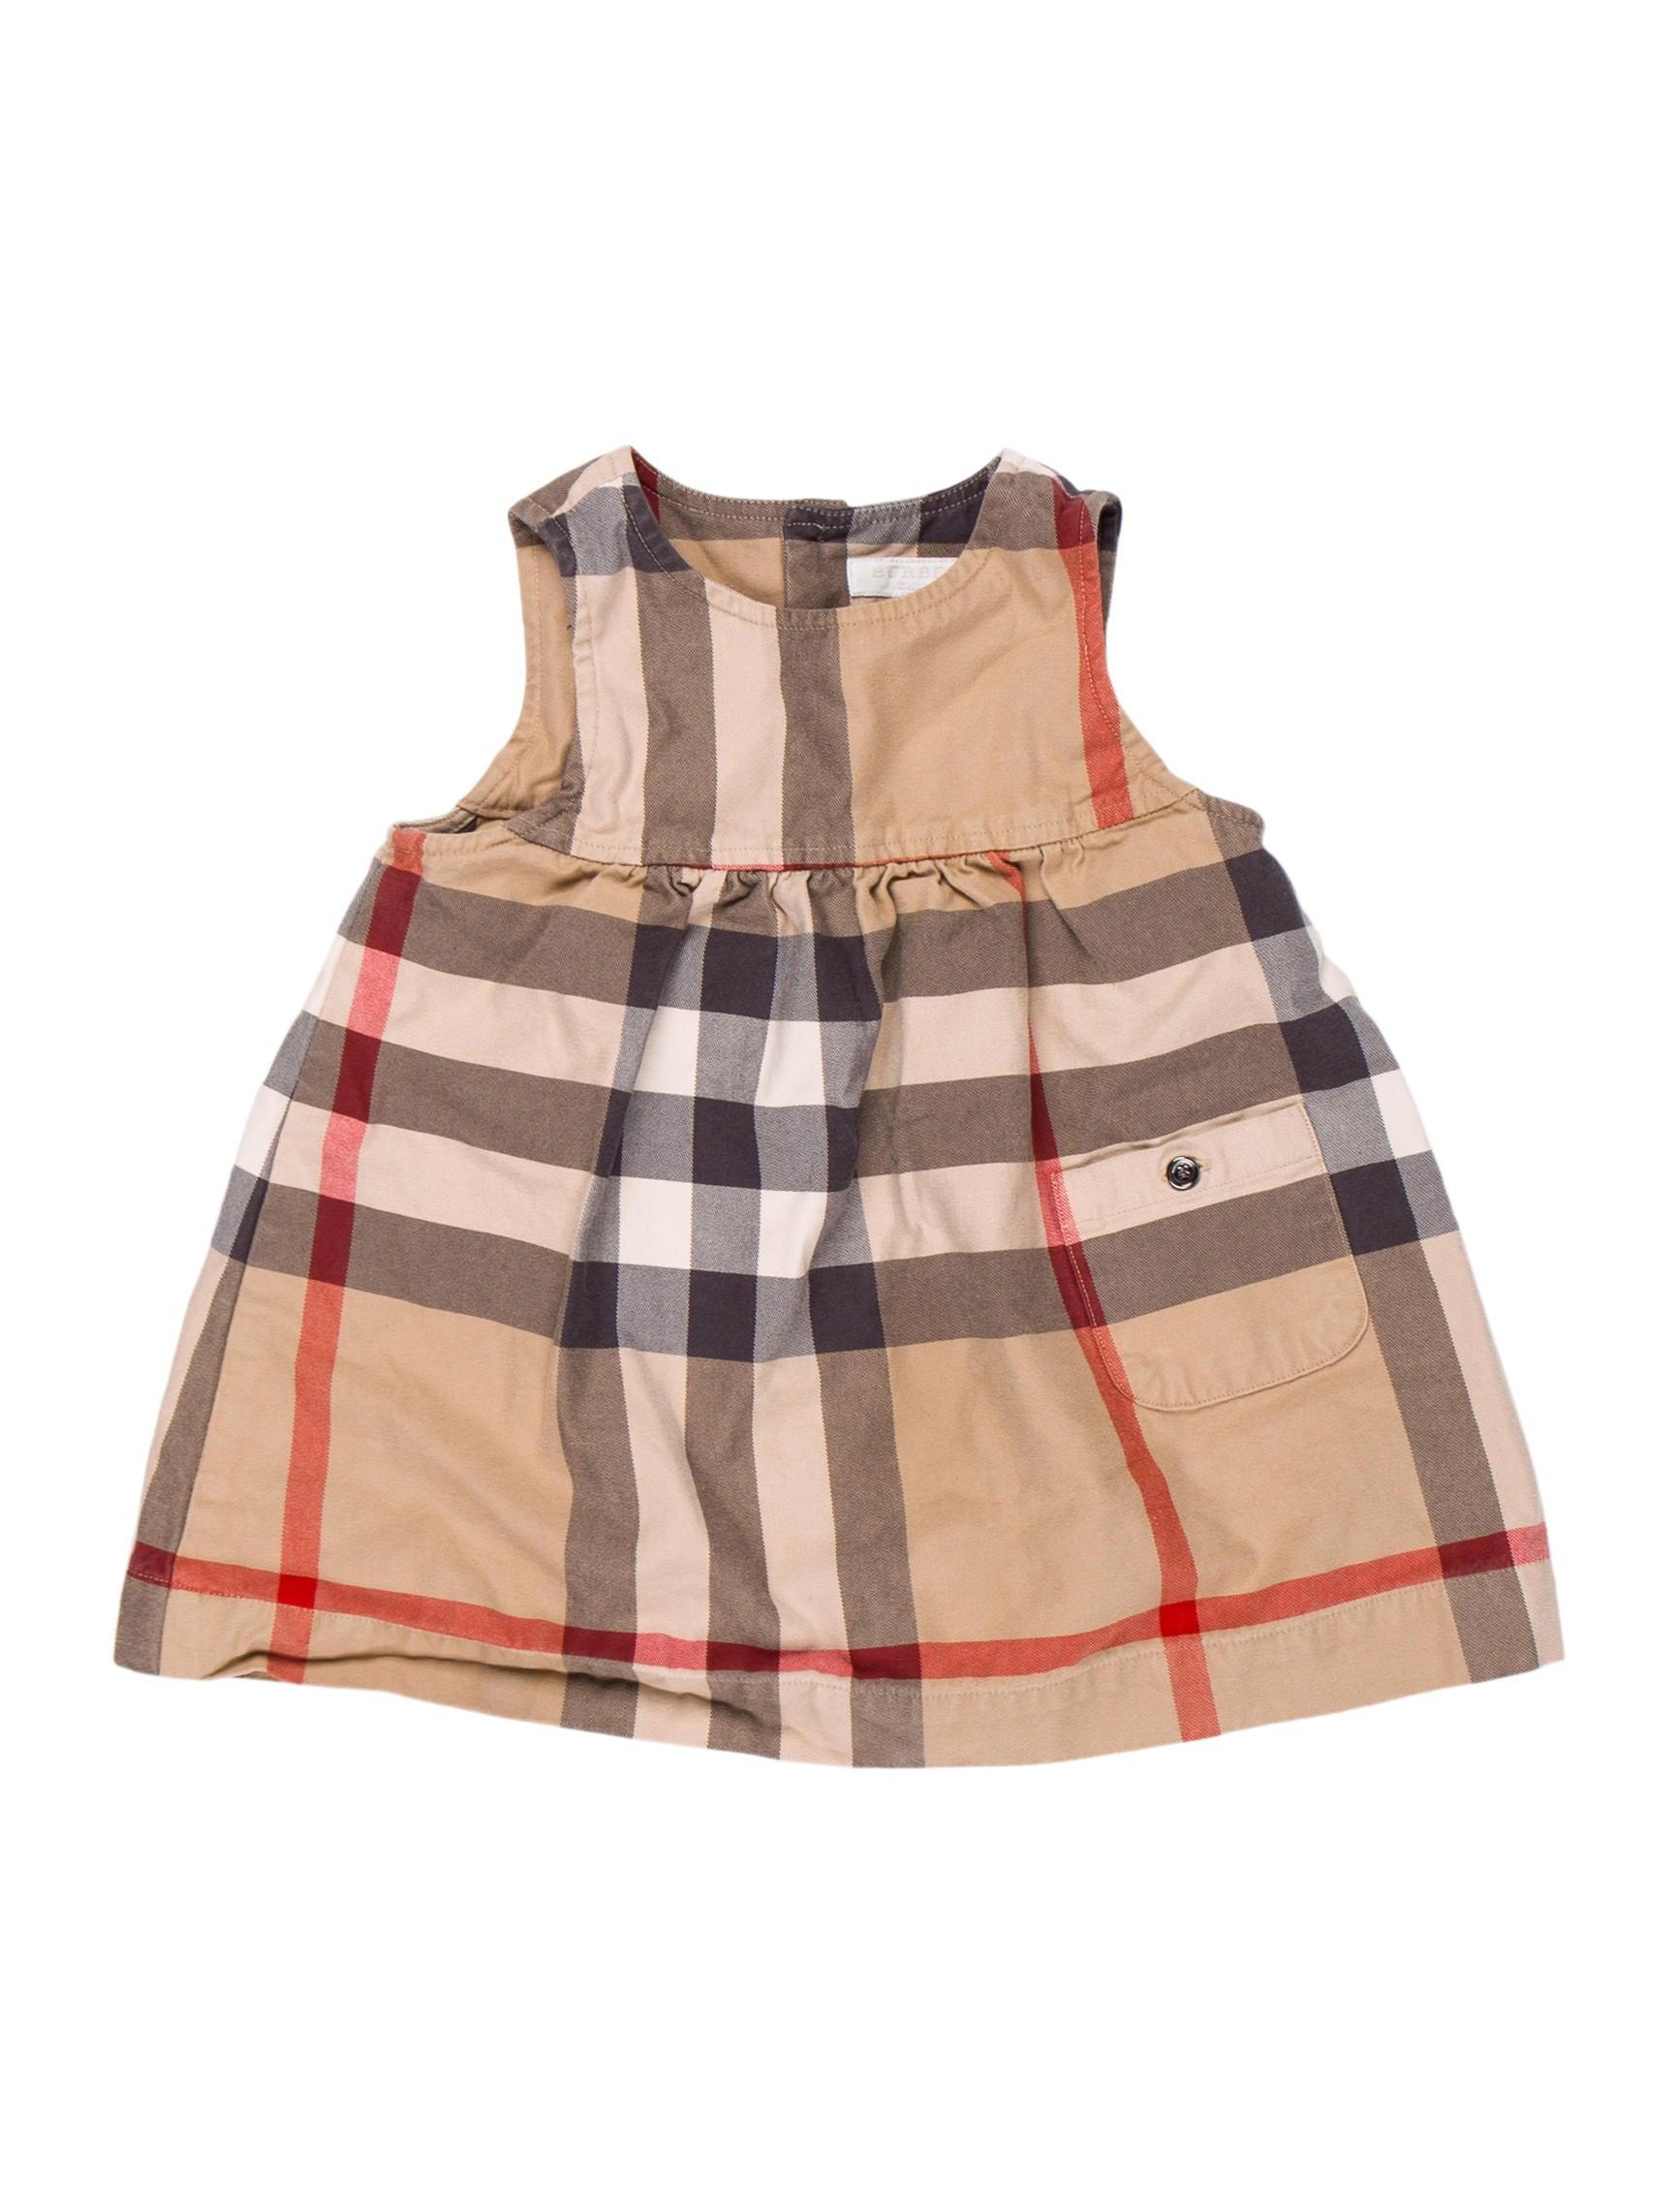 ddce2107119f Burberry Girls  Nova Check Flare Dress - Girls - BUR98443